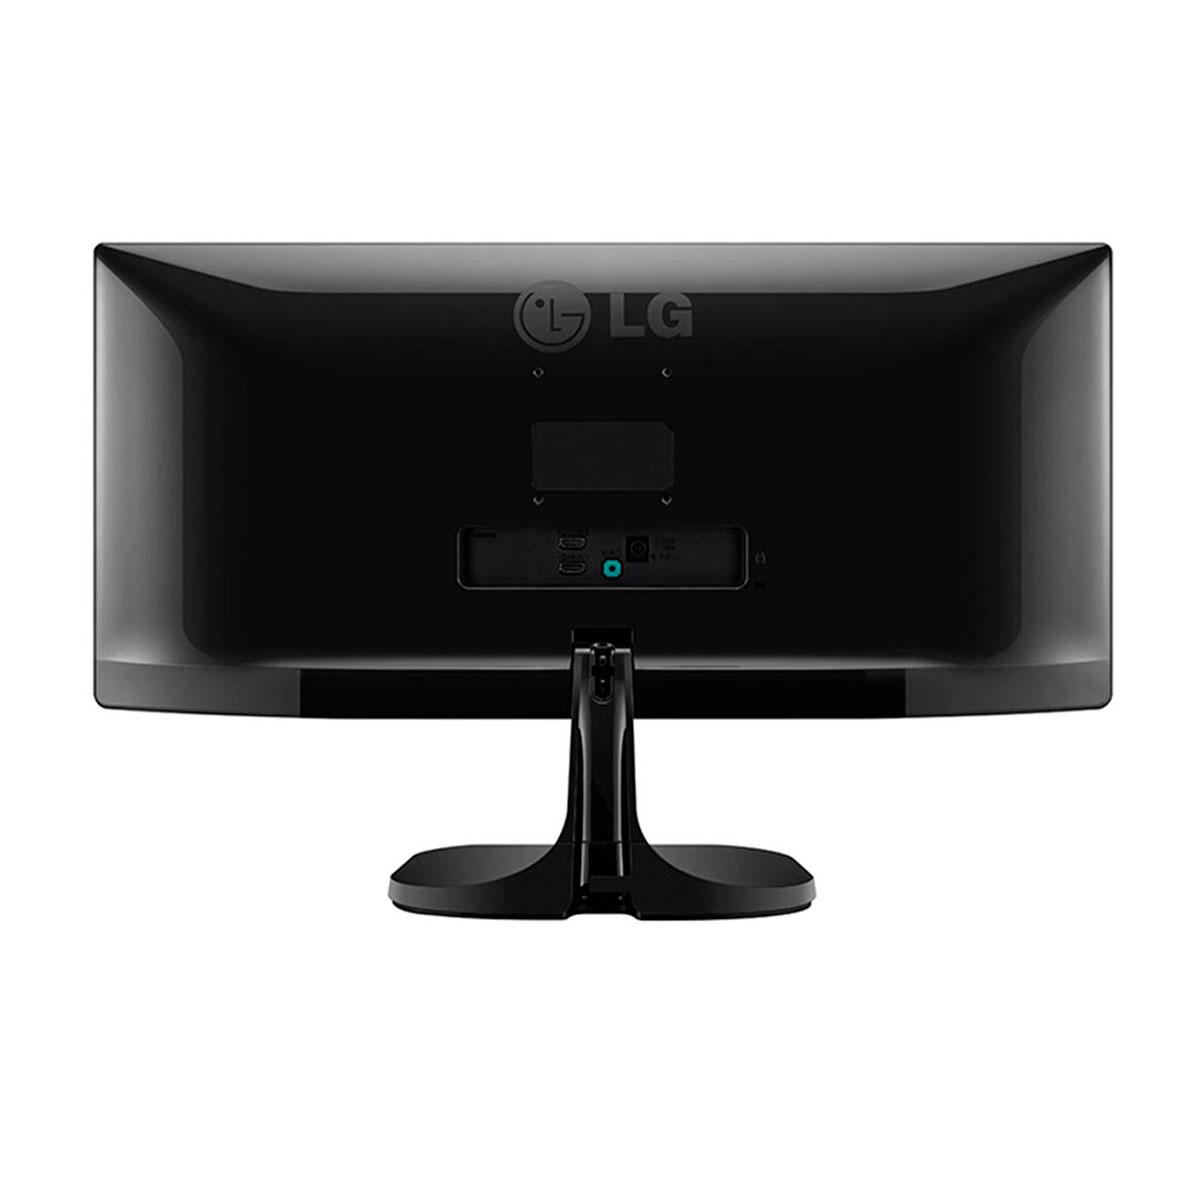 "Monitor Gamer LG 25UM58G-P, 25"" Ultrawide, 21:9, 1ms, 75Hz, IPS, HDMI, Full HD - 2560x1080"